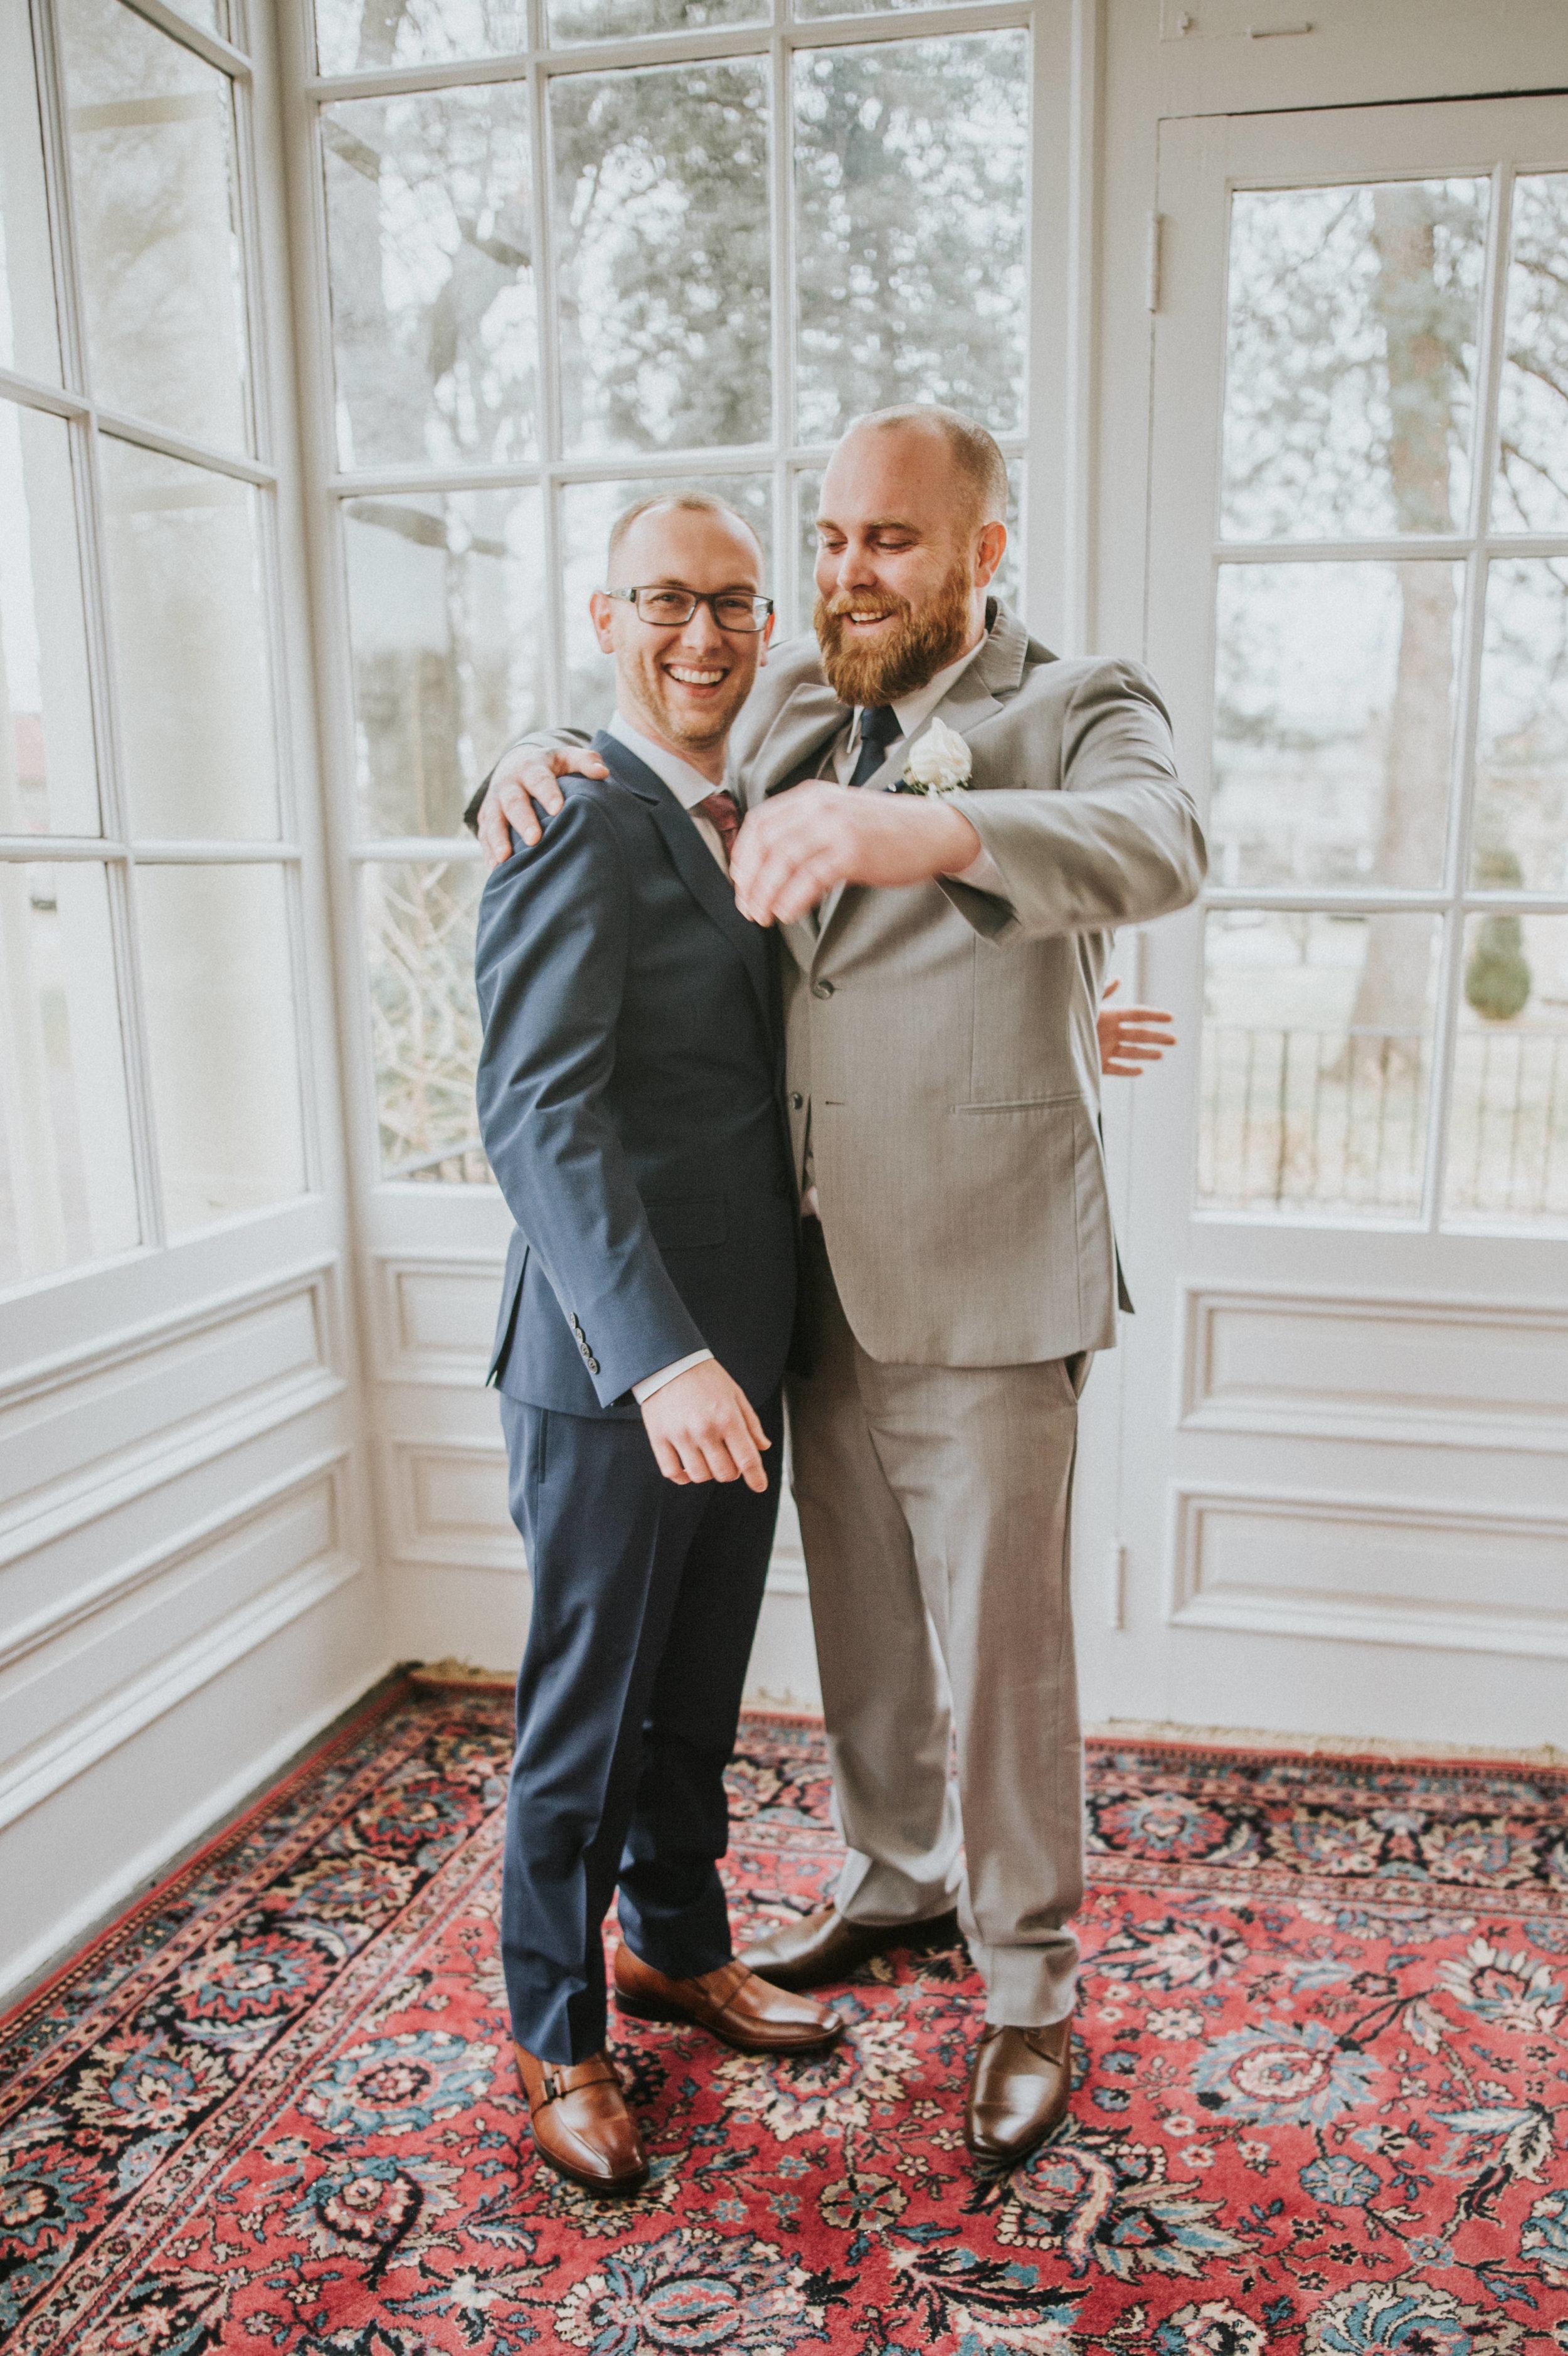 Collingswood-Grand-Ballroom-Wedding-Chris-and-Kevin_-213.jpg